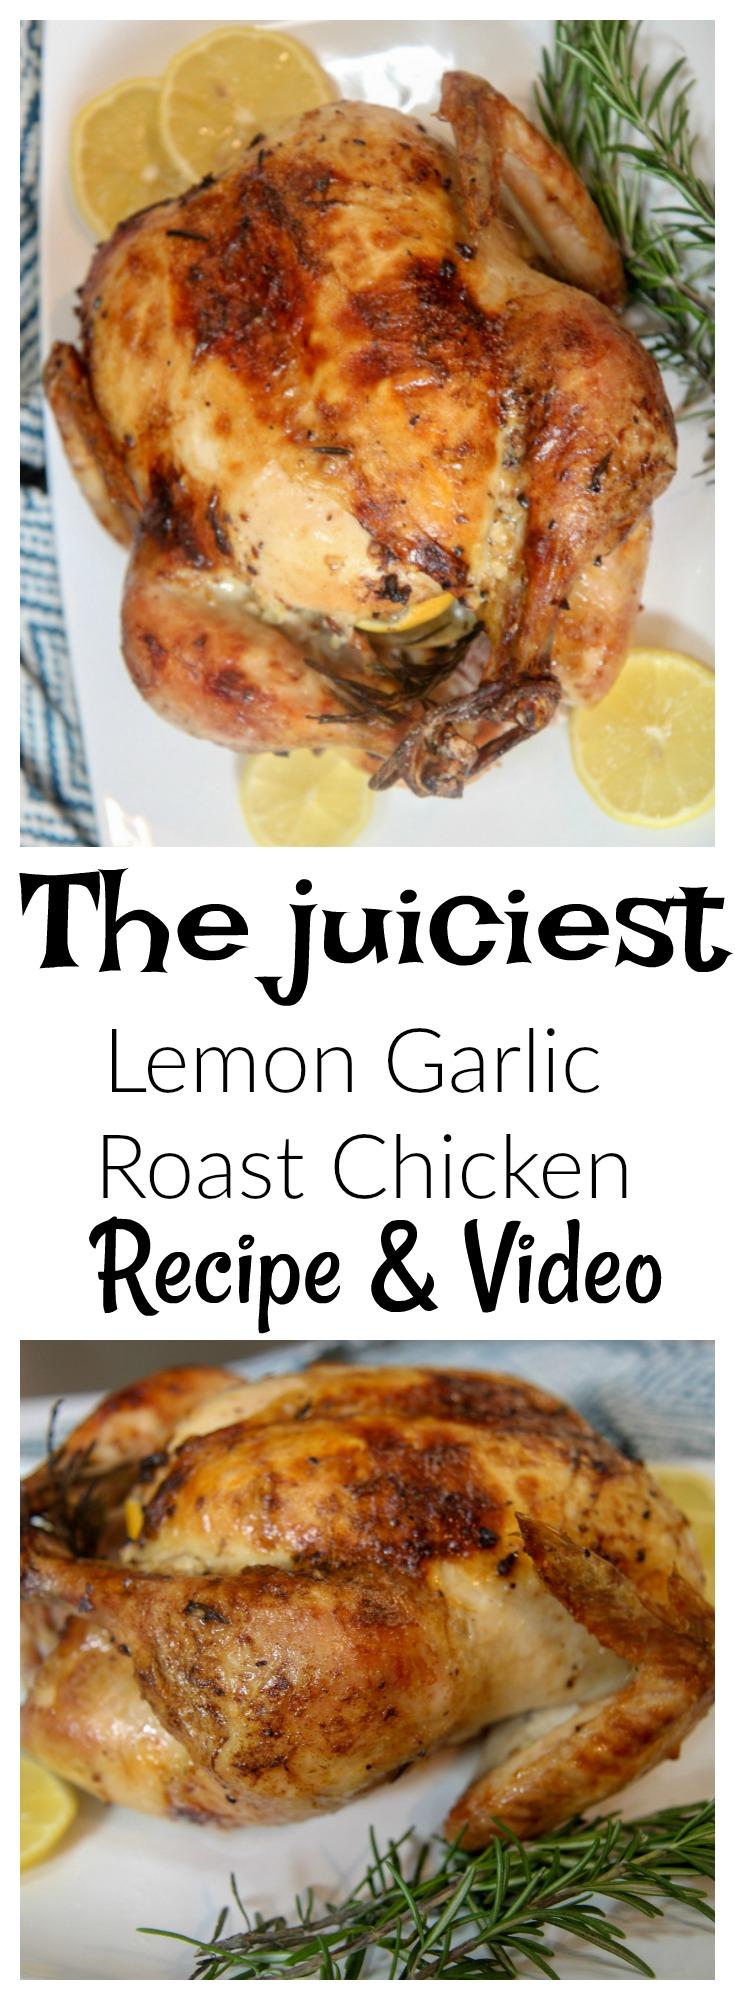 Lemon, Garlic, and Rosemary Roast Chicken